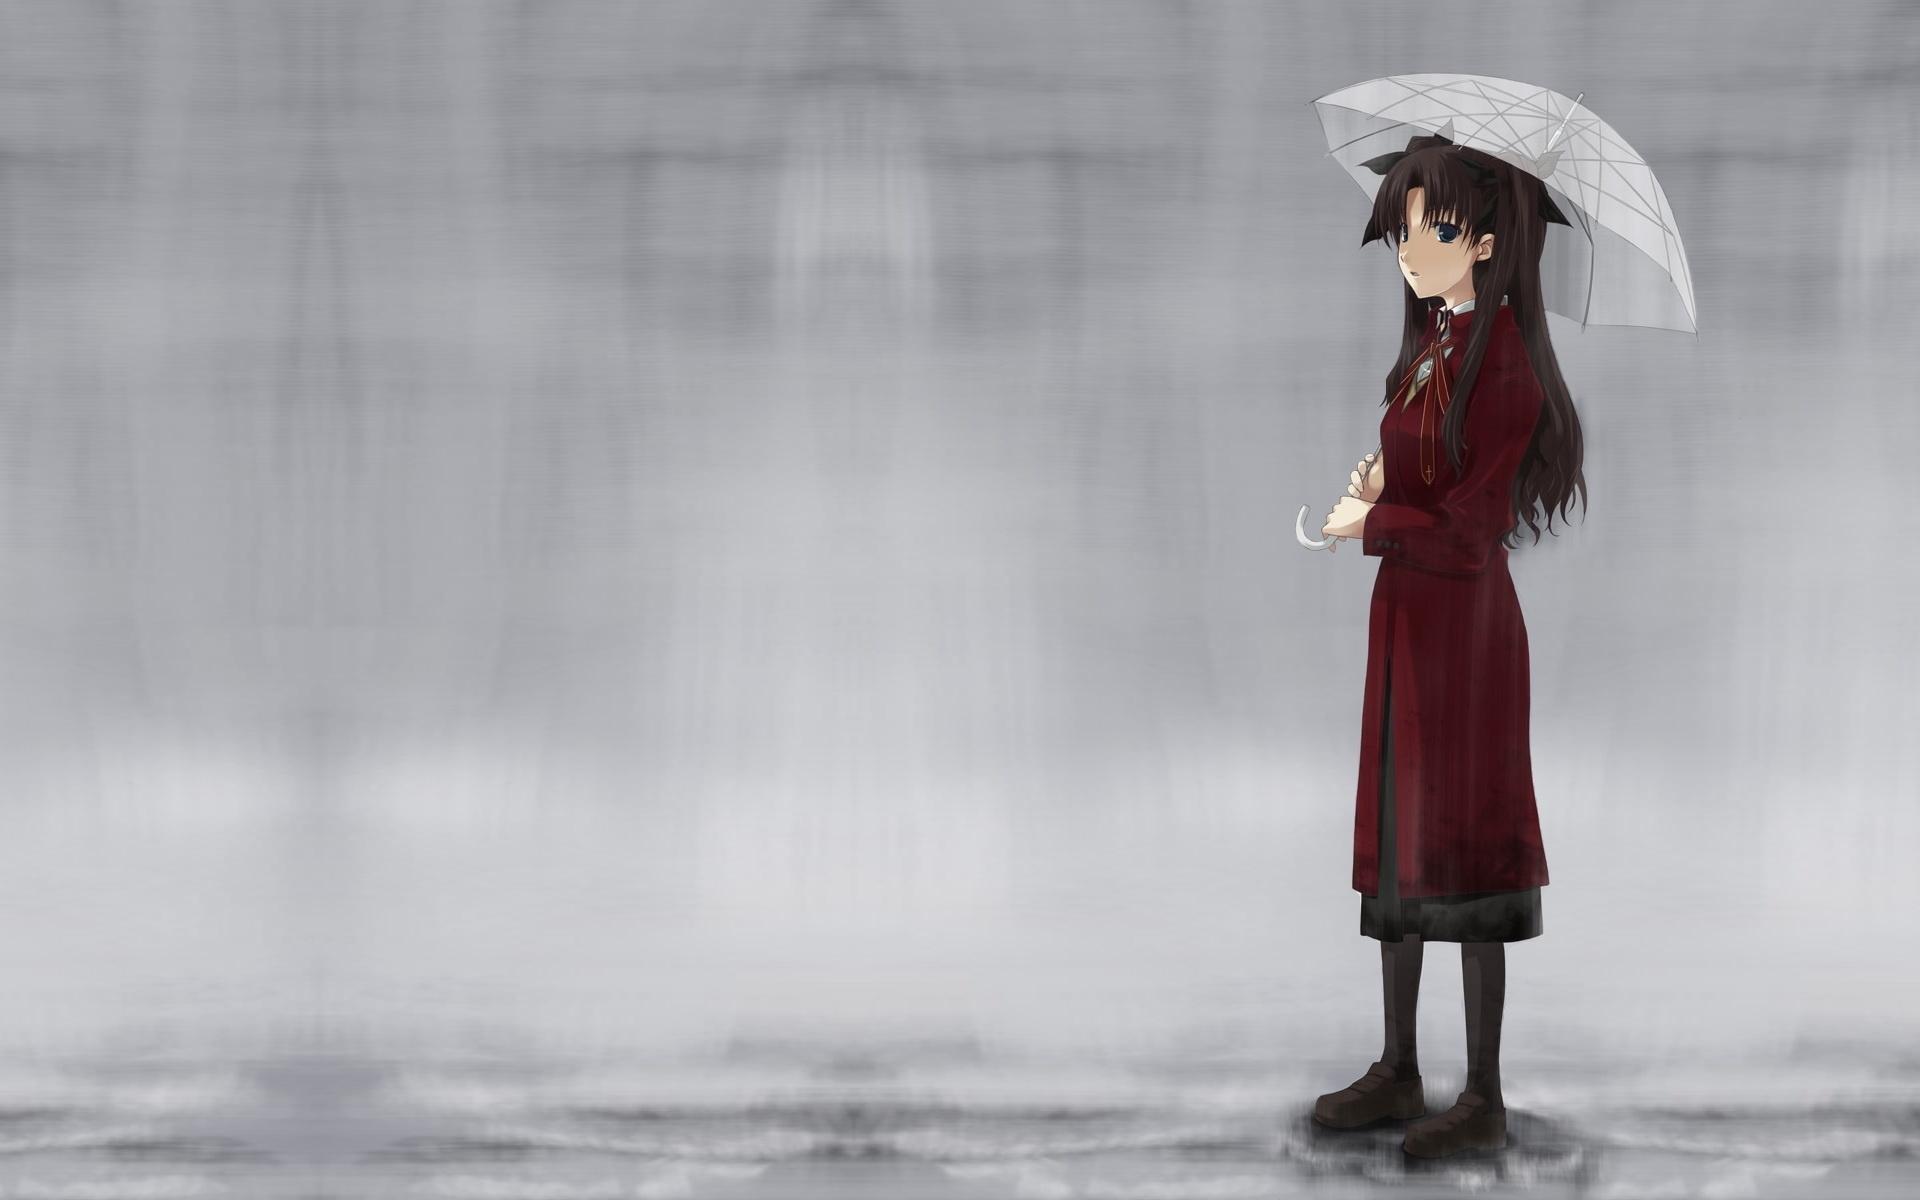 Girl Walking In Rain Wallpapers 1920x1200 463734